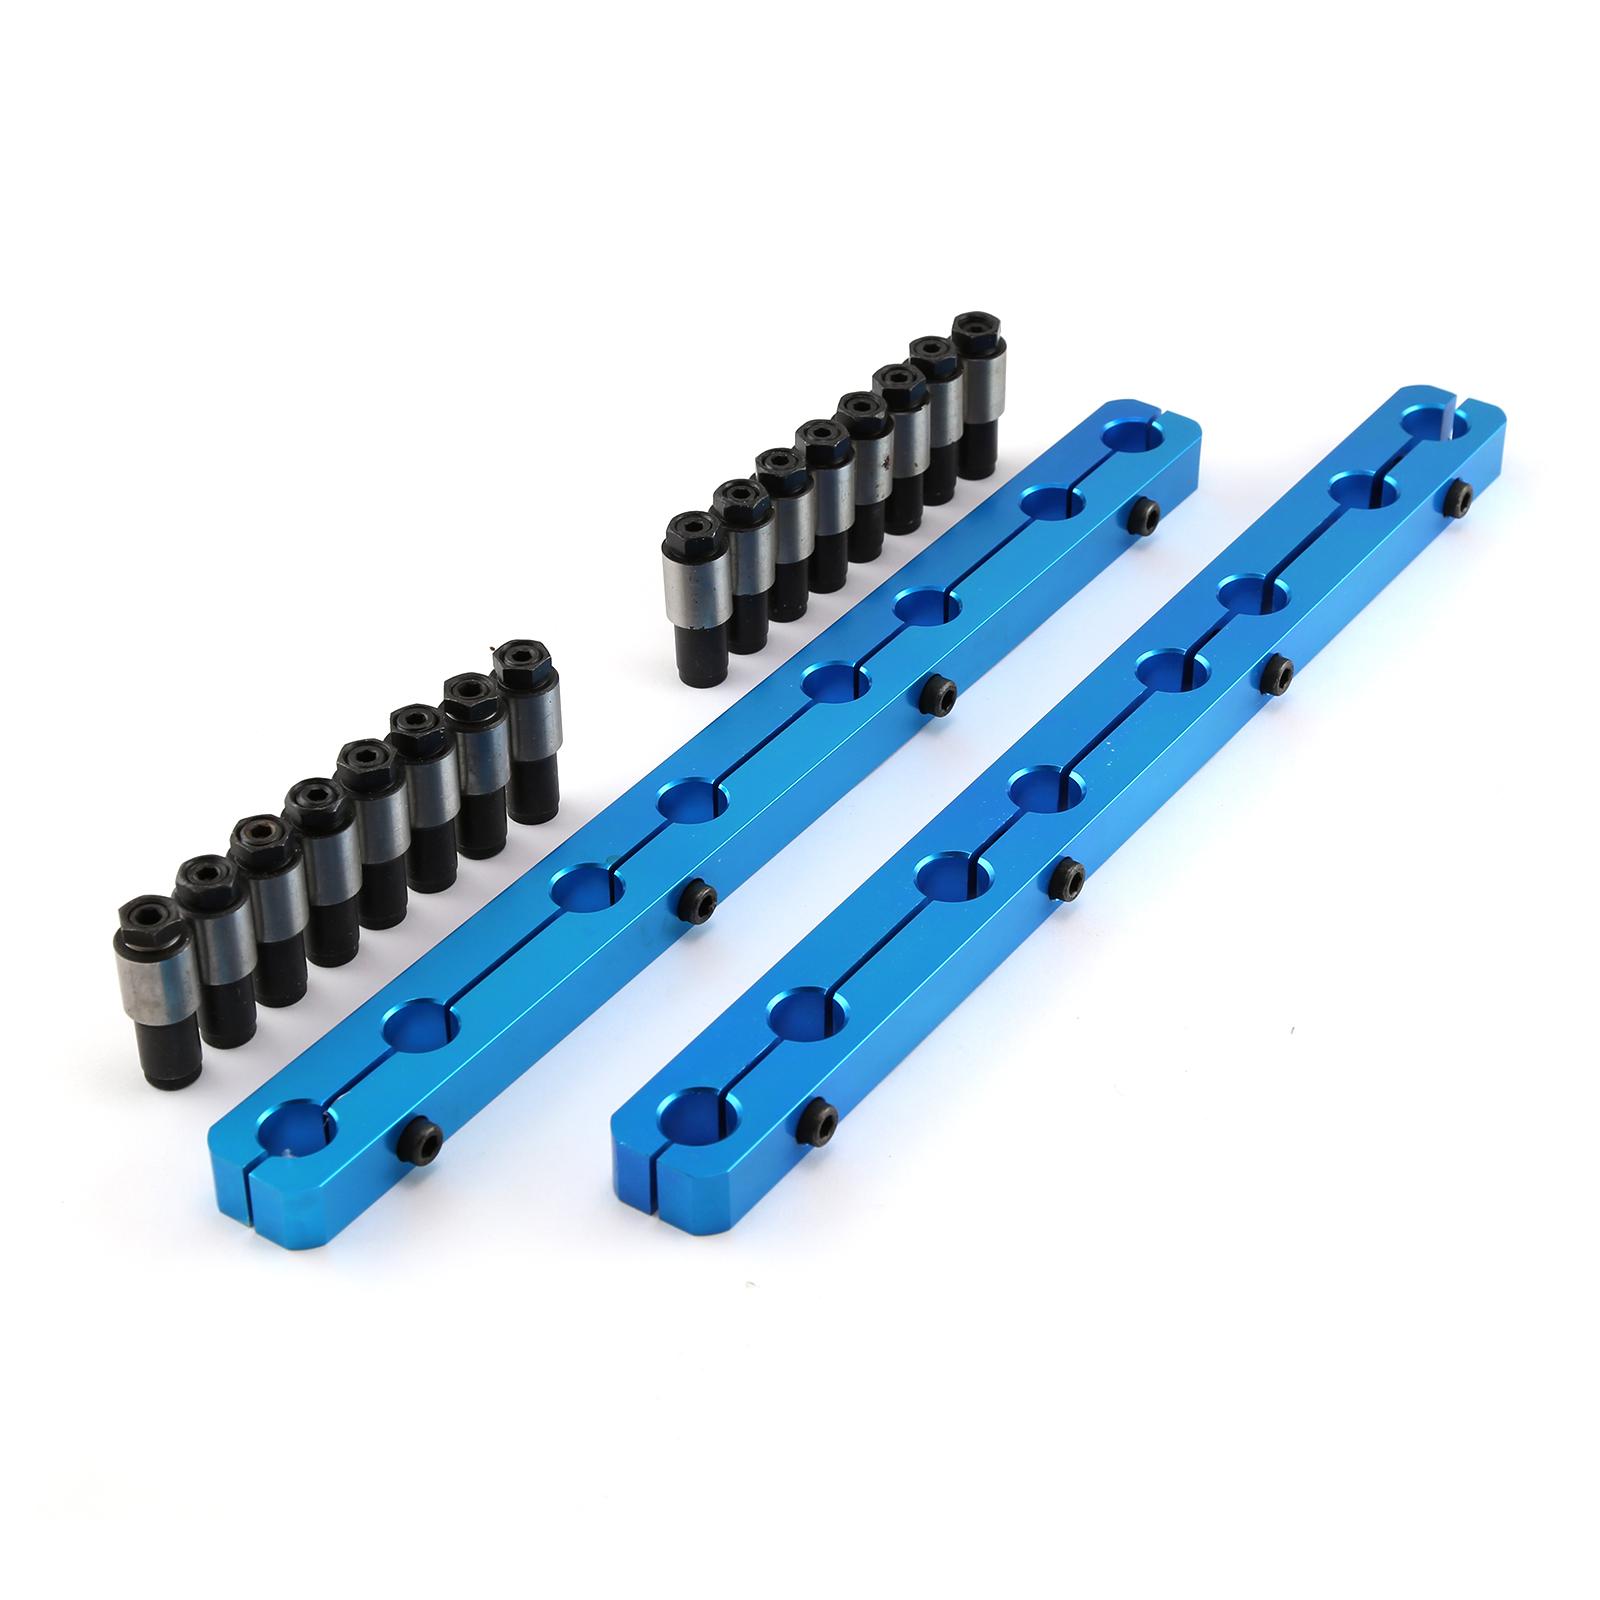 "Ford SB 289 302 351 Windsor Rocker Stud Girdle Kit Blue With 3/8"" Posi Locks"